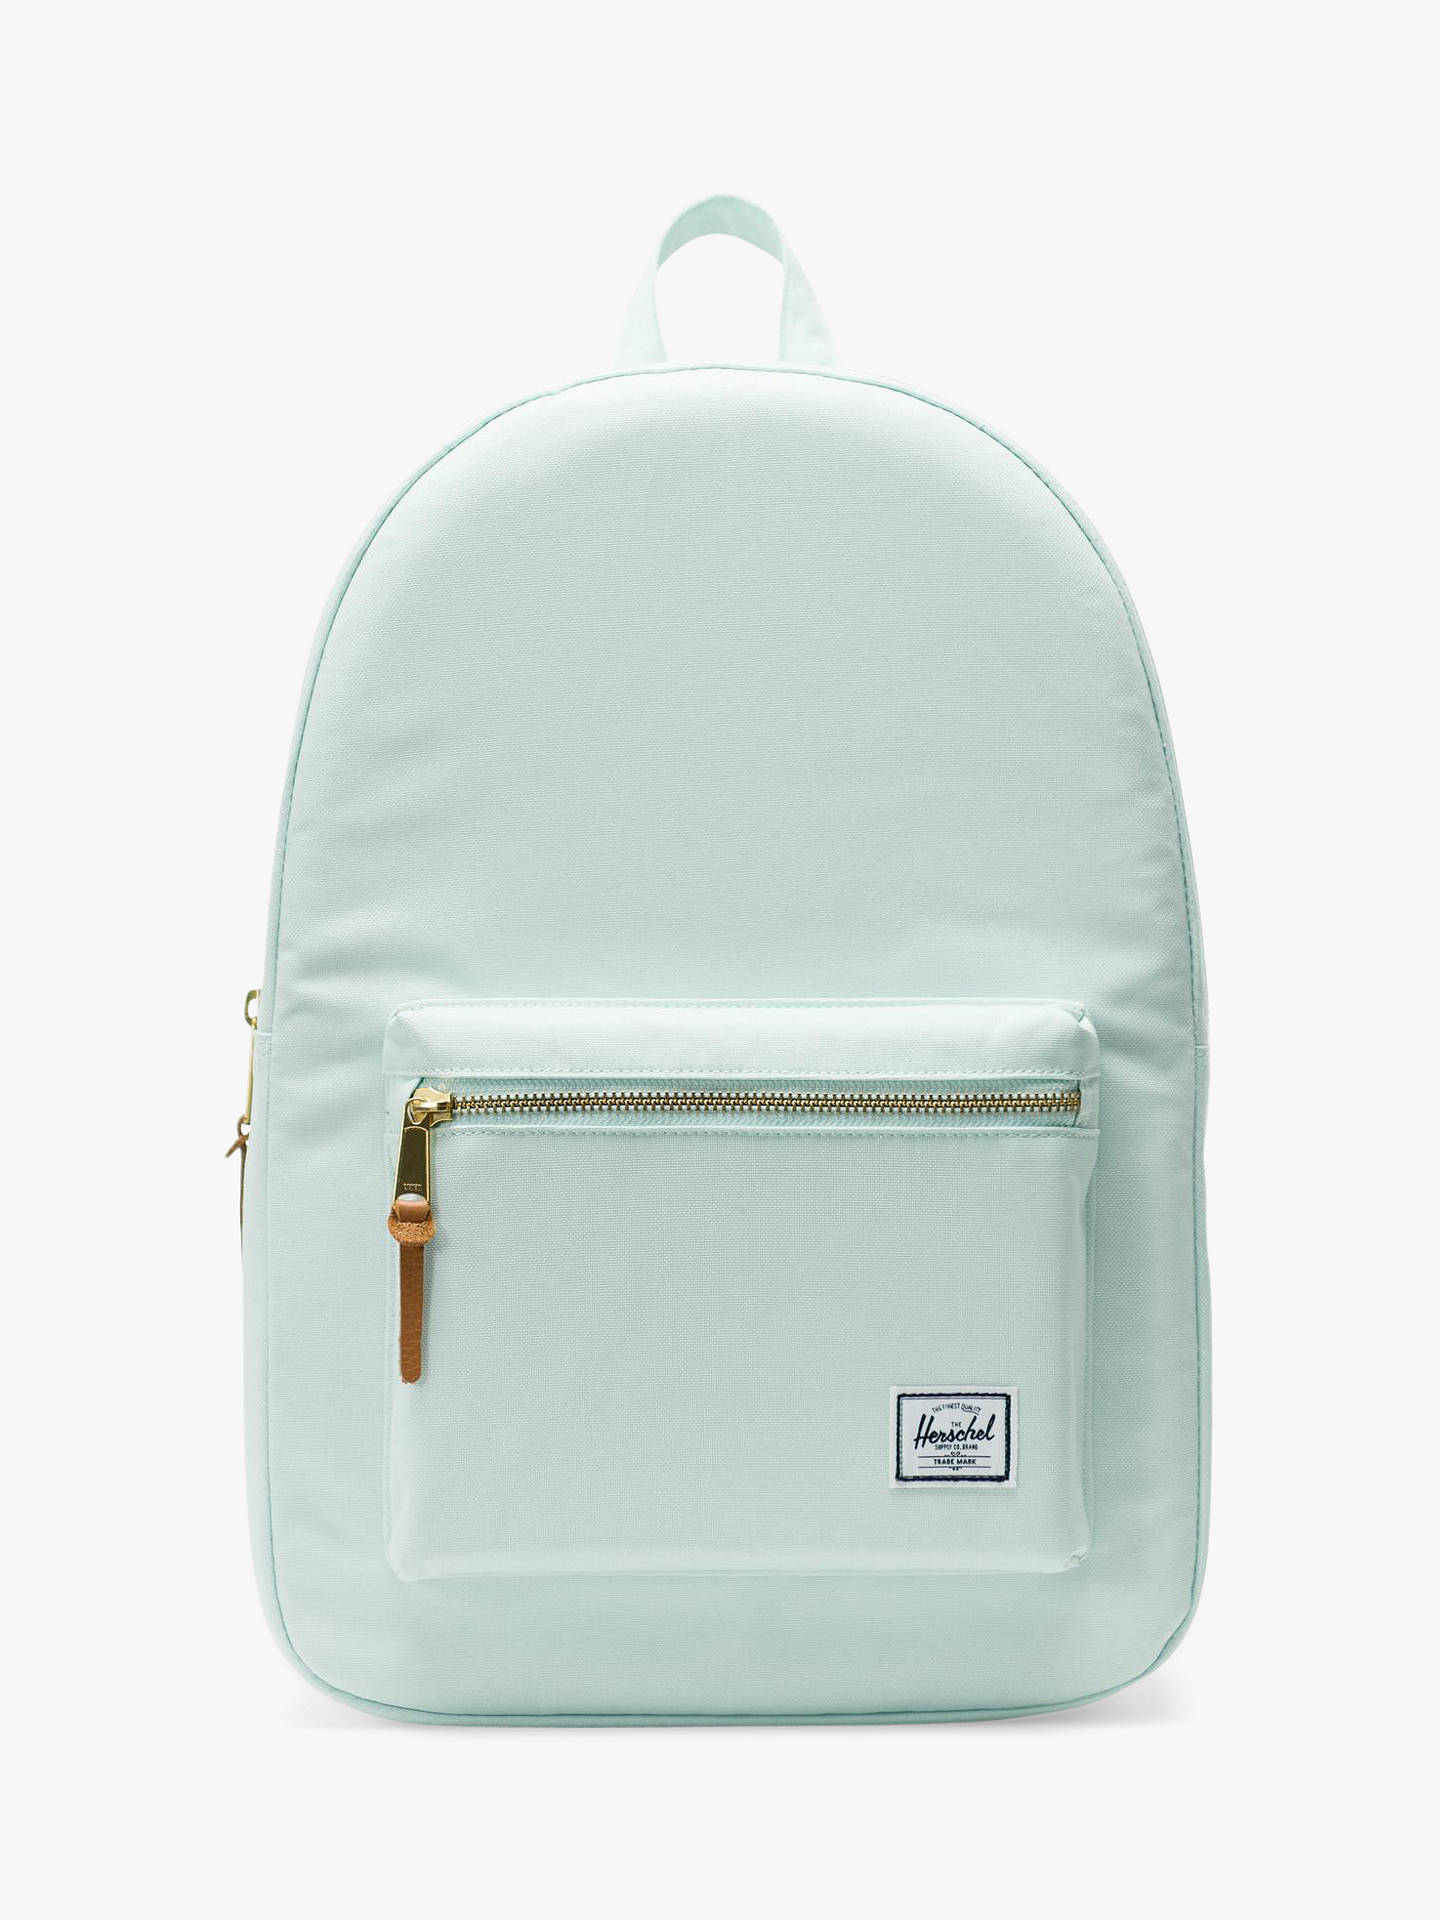 c5ac5585594 Herschel Supply Co. Settlement Backpack at John Lewis   Partners